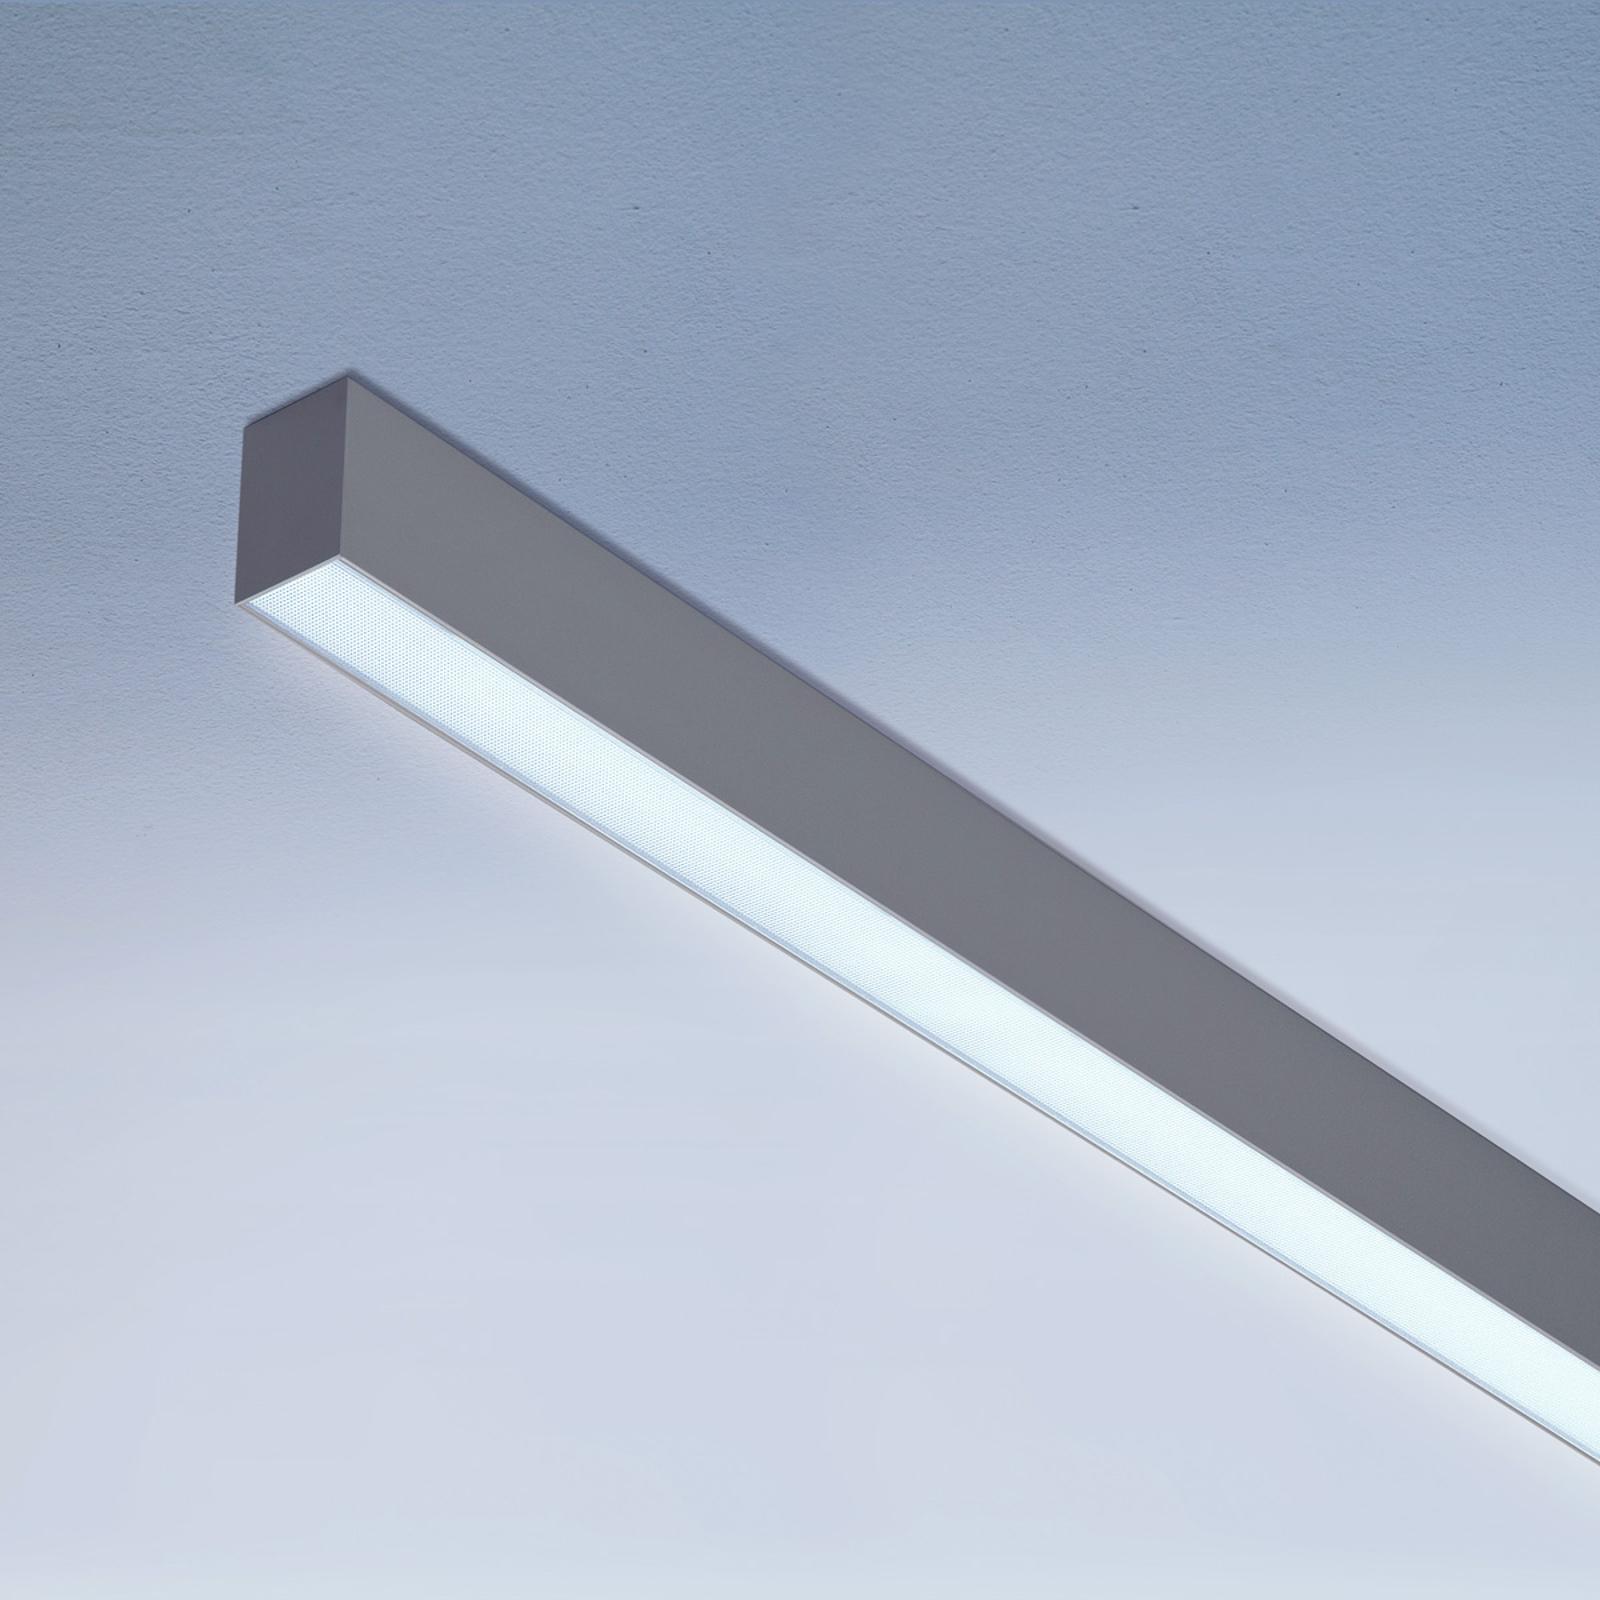 Medium Power - LED-Wandleuchte Matric-A3 118,2 cm